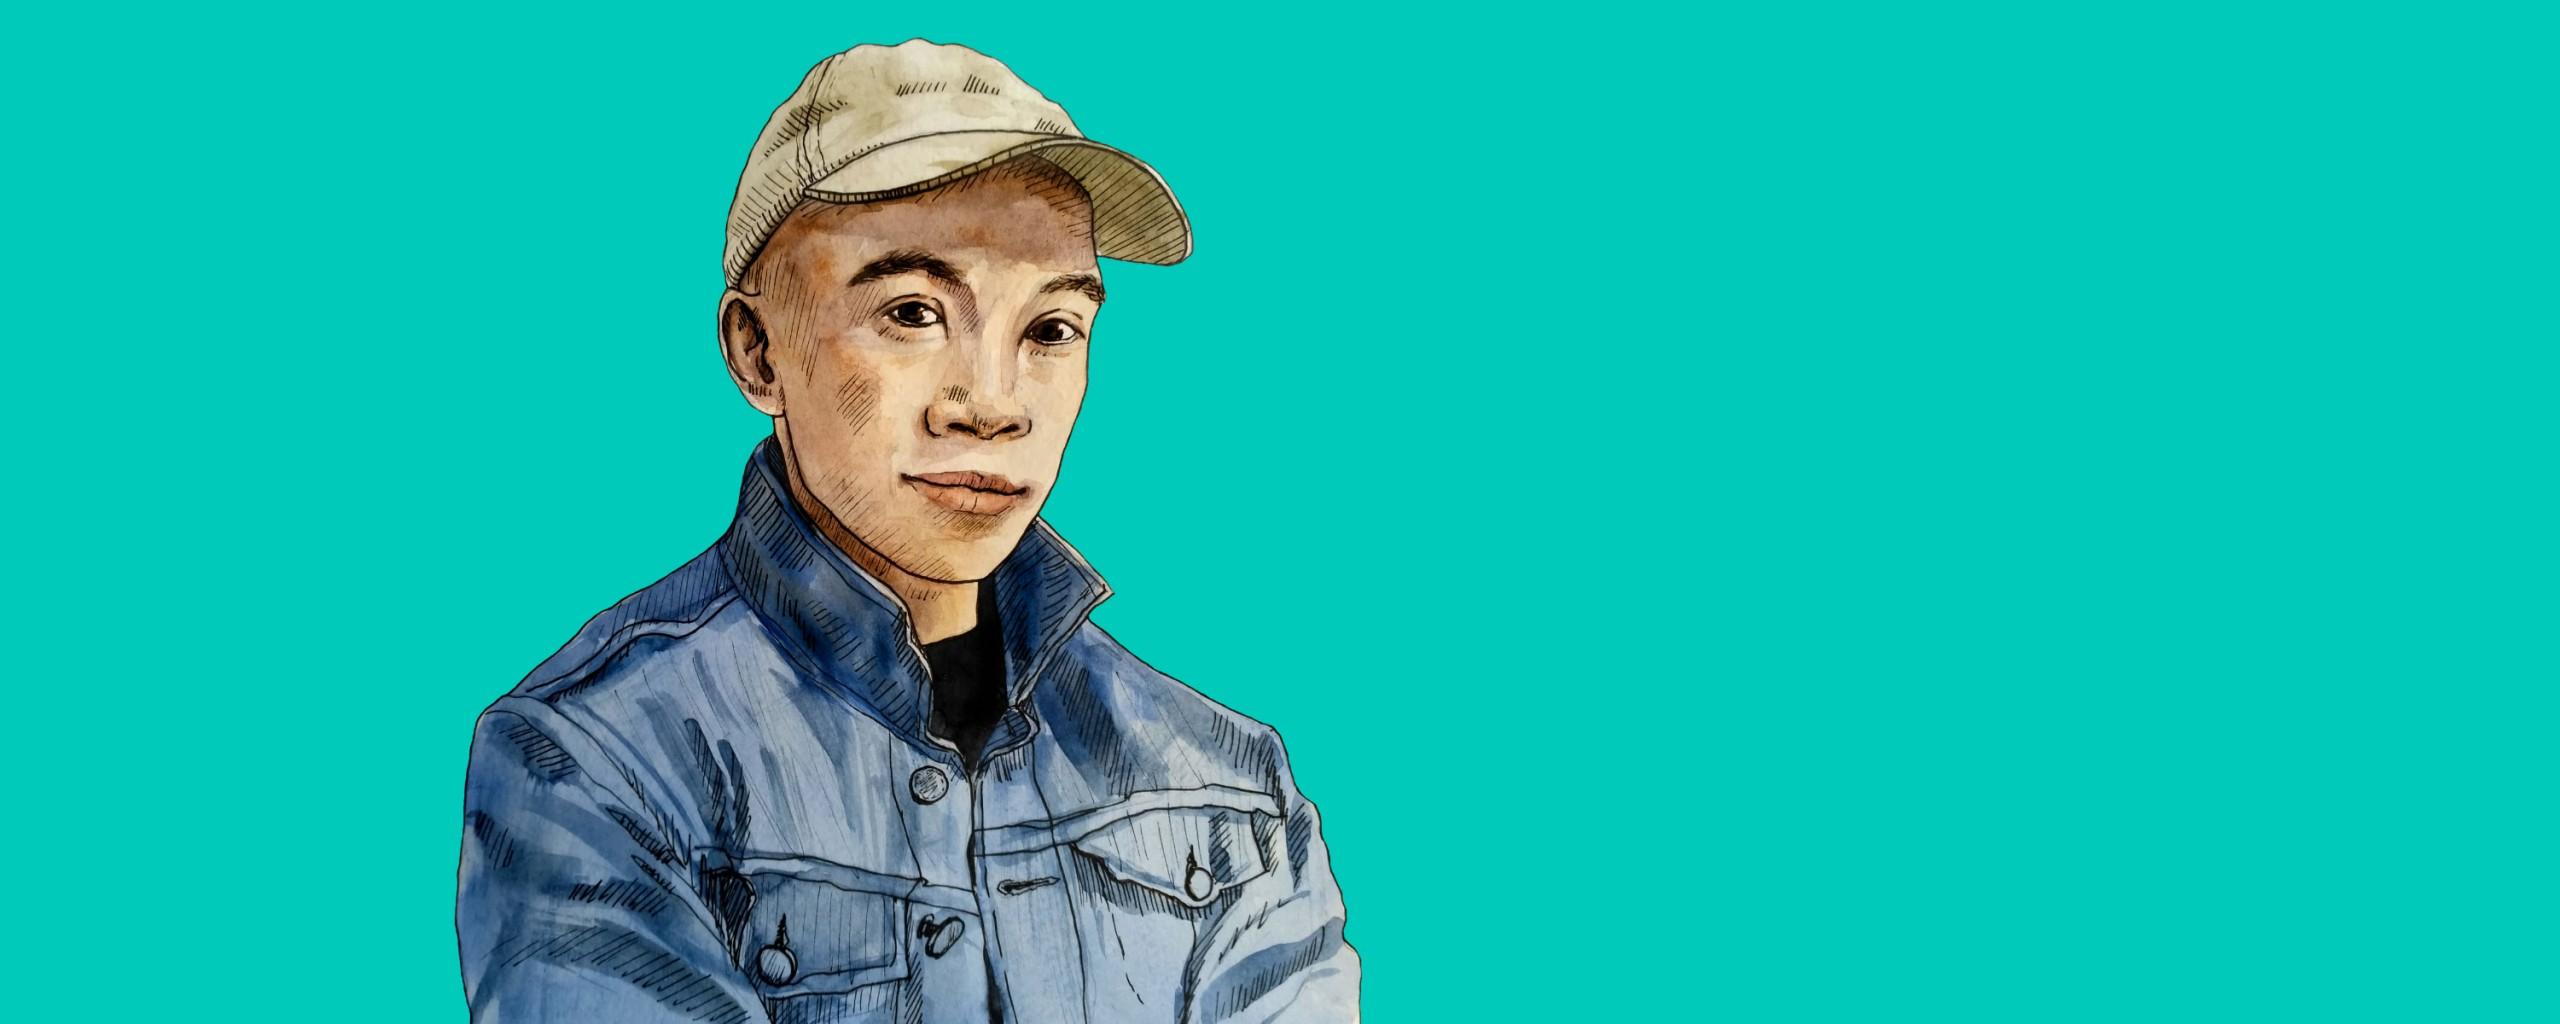 Illustrated portrait of Rich Tu